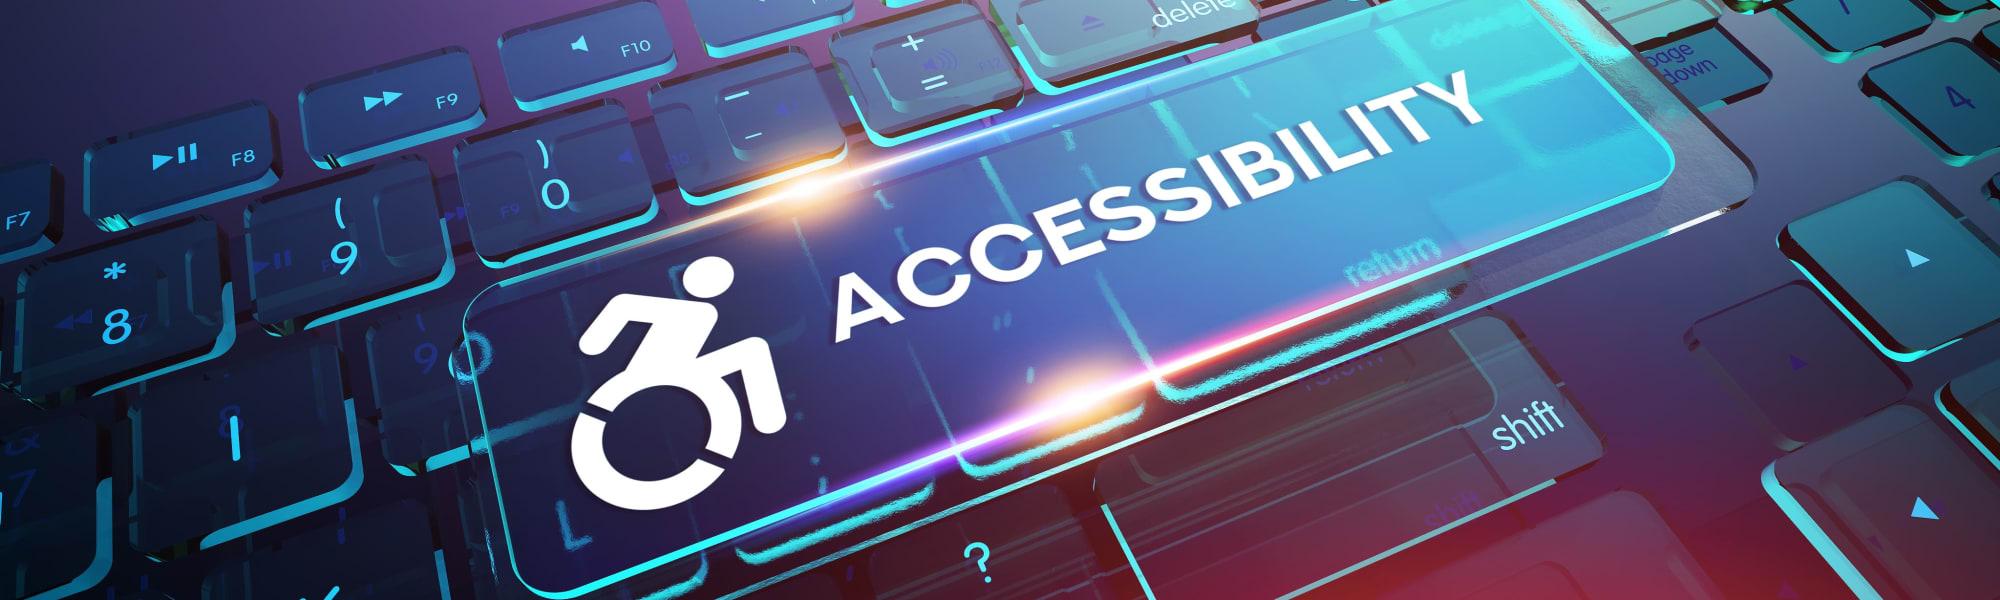 Accessibility policy for Granite 550 in Casper, Wyoming